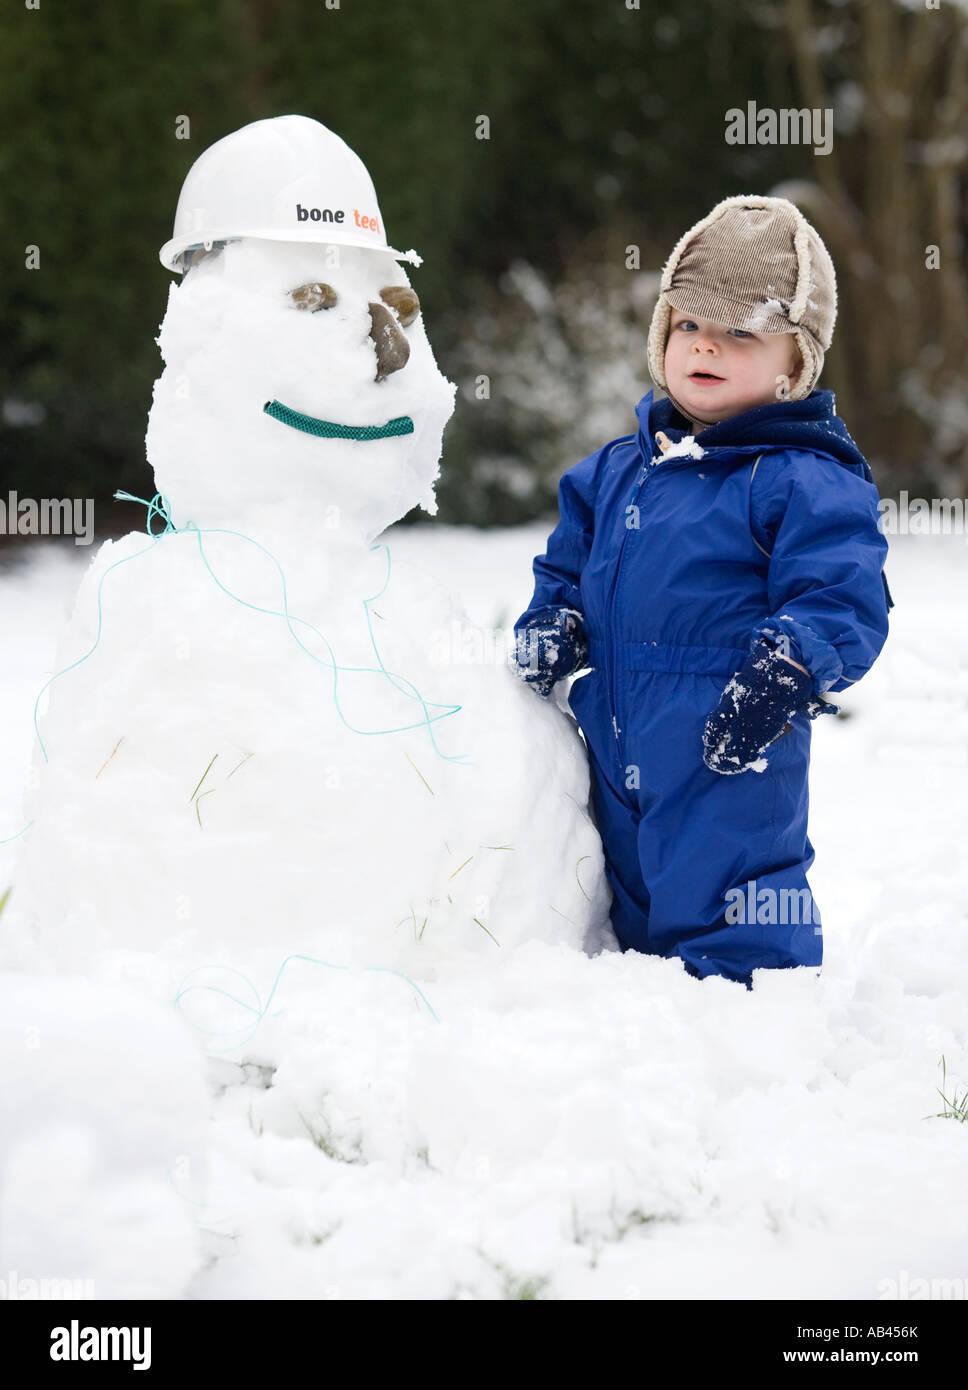 4e58258bd Play Snow Suit Stock Photos   Play Snow Suit Stock Images - Alamy